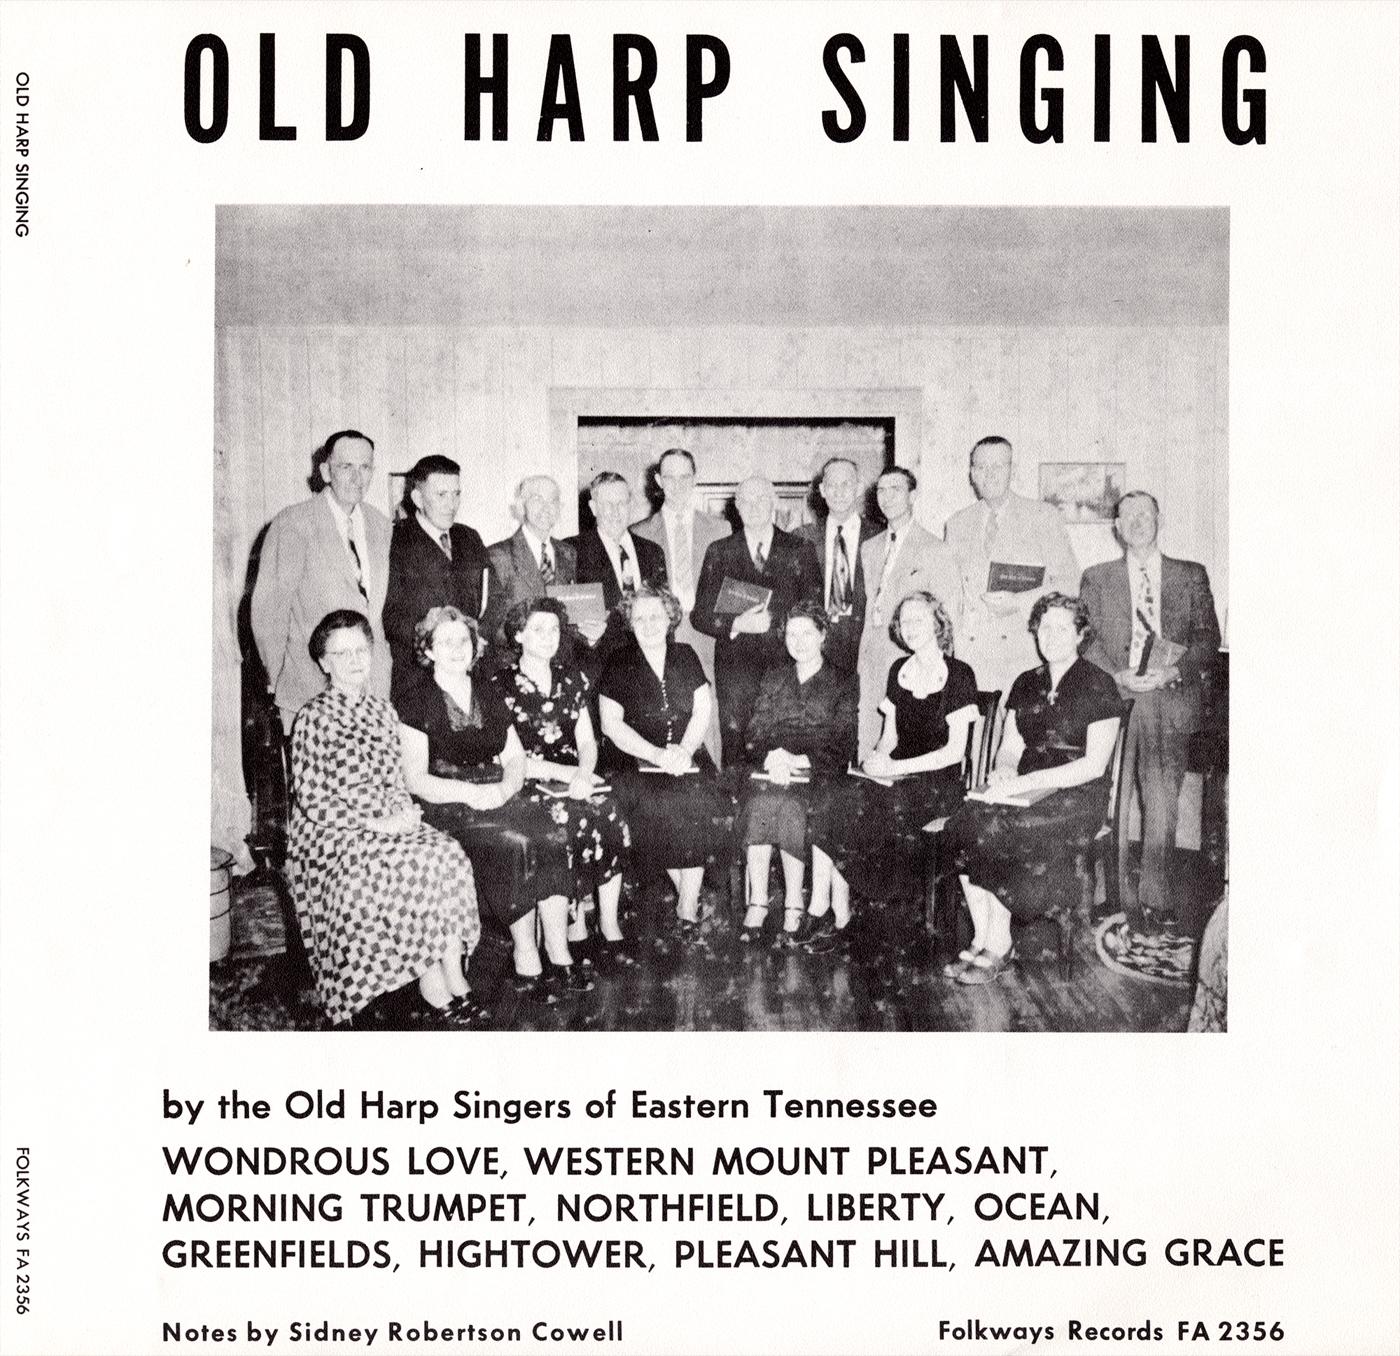 Old Harp Singing | Smithsonian Folkways Recordings